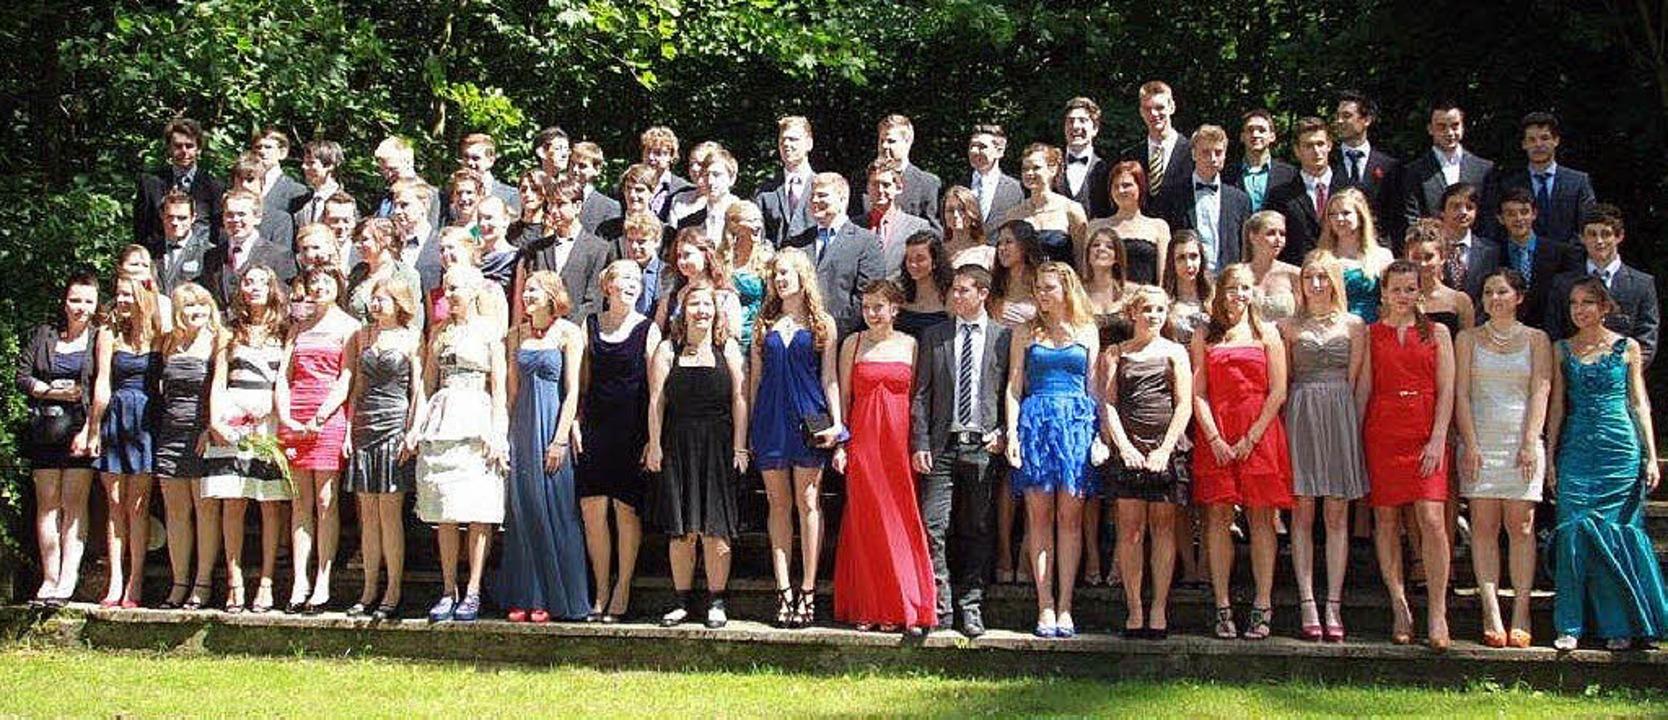 Der Abiturjahrgang 2012 am Kolleg St. Sebastian in Stegen.   | Foto: Markus strecker